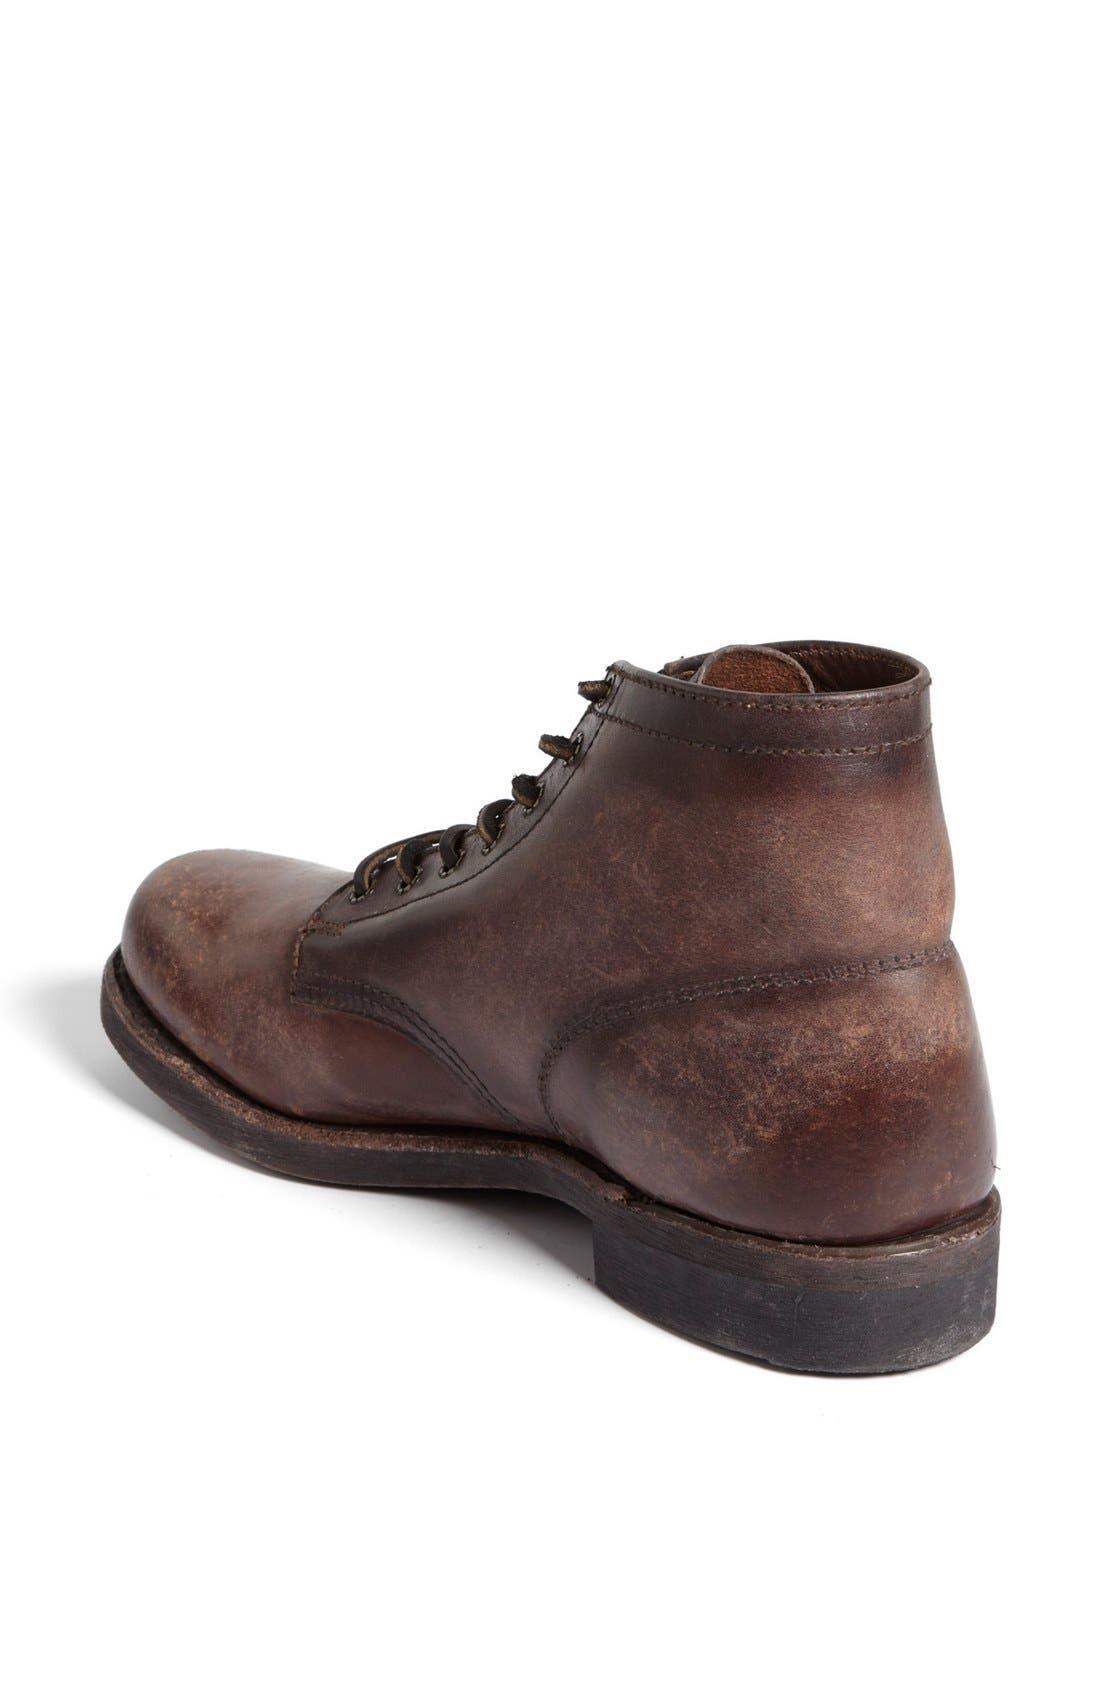 Alternate Image 2  - Frye 'Prison' Leather Boot